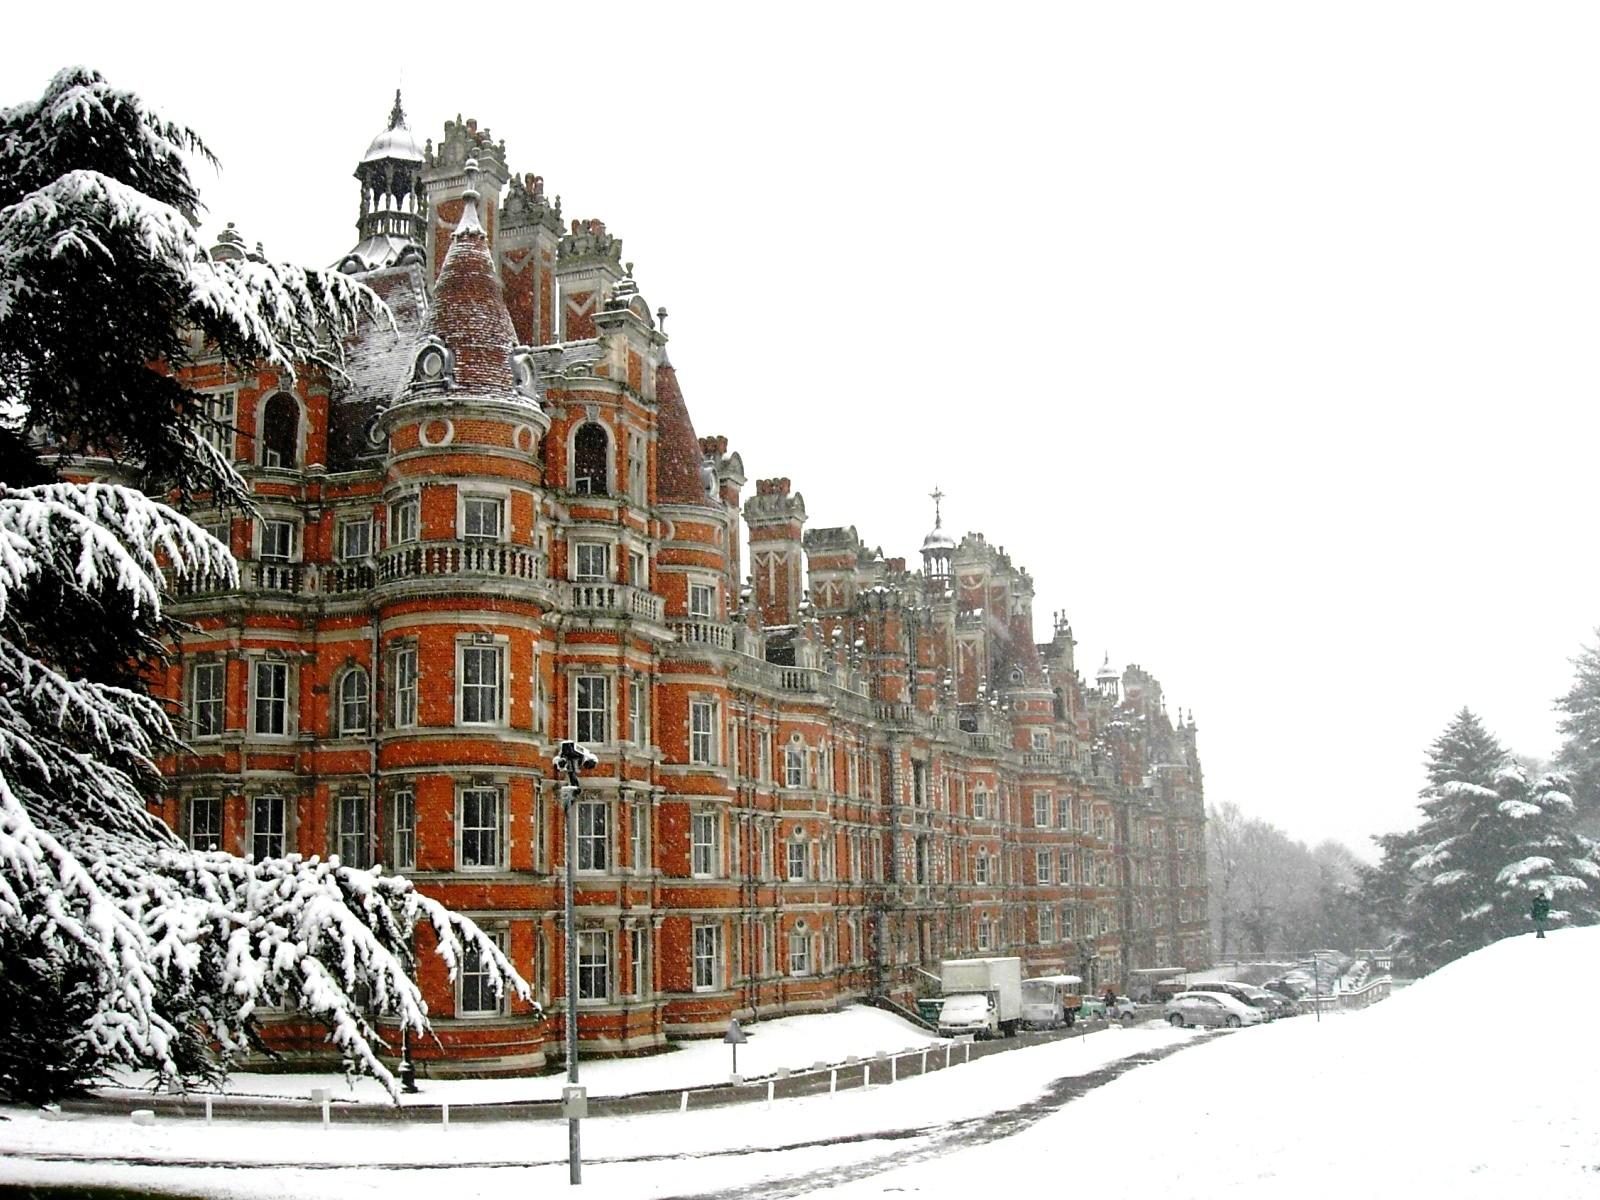 Weekly Photo Challenge Changing Seasons Royal Holloway